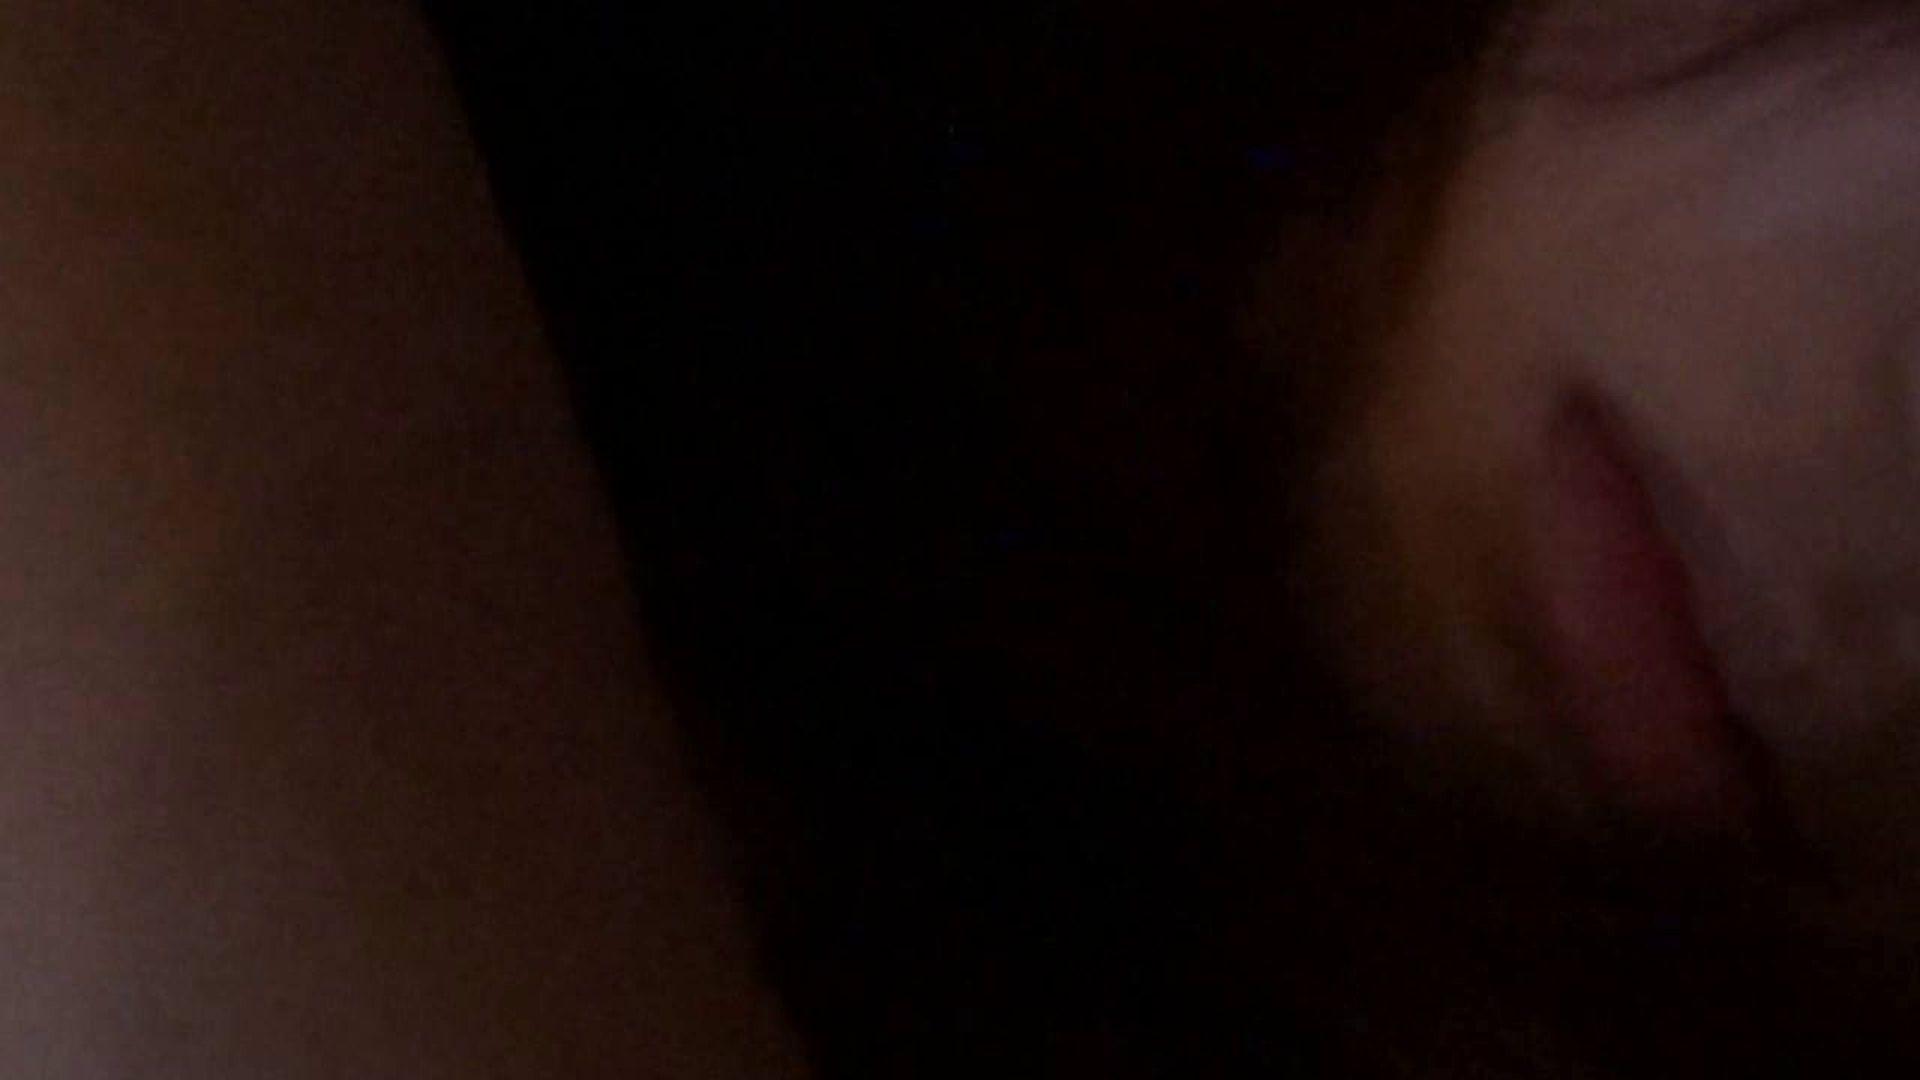 vol.27 【SKちゃん(ホテル)】ガールズバー店員 19歳 ギャルの実態 覗きワレメ動画紹介 97pic 3